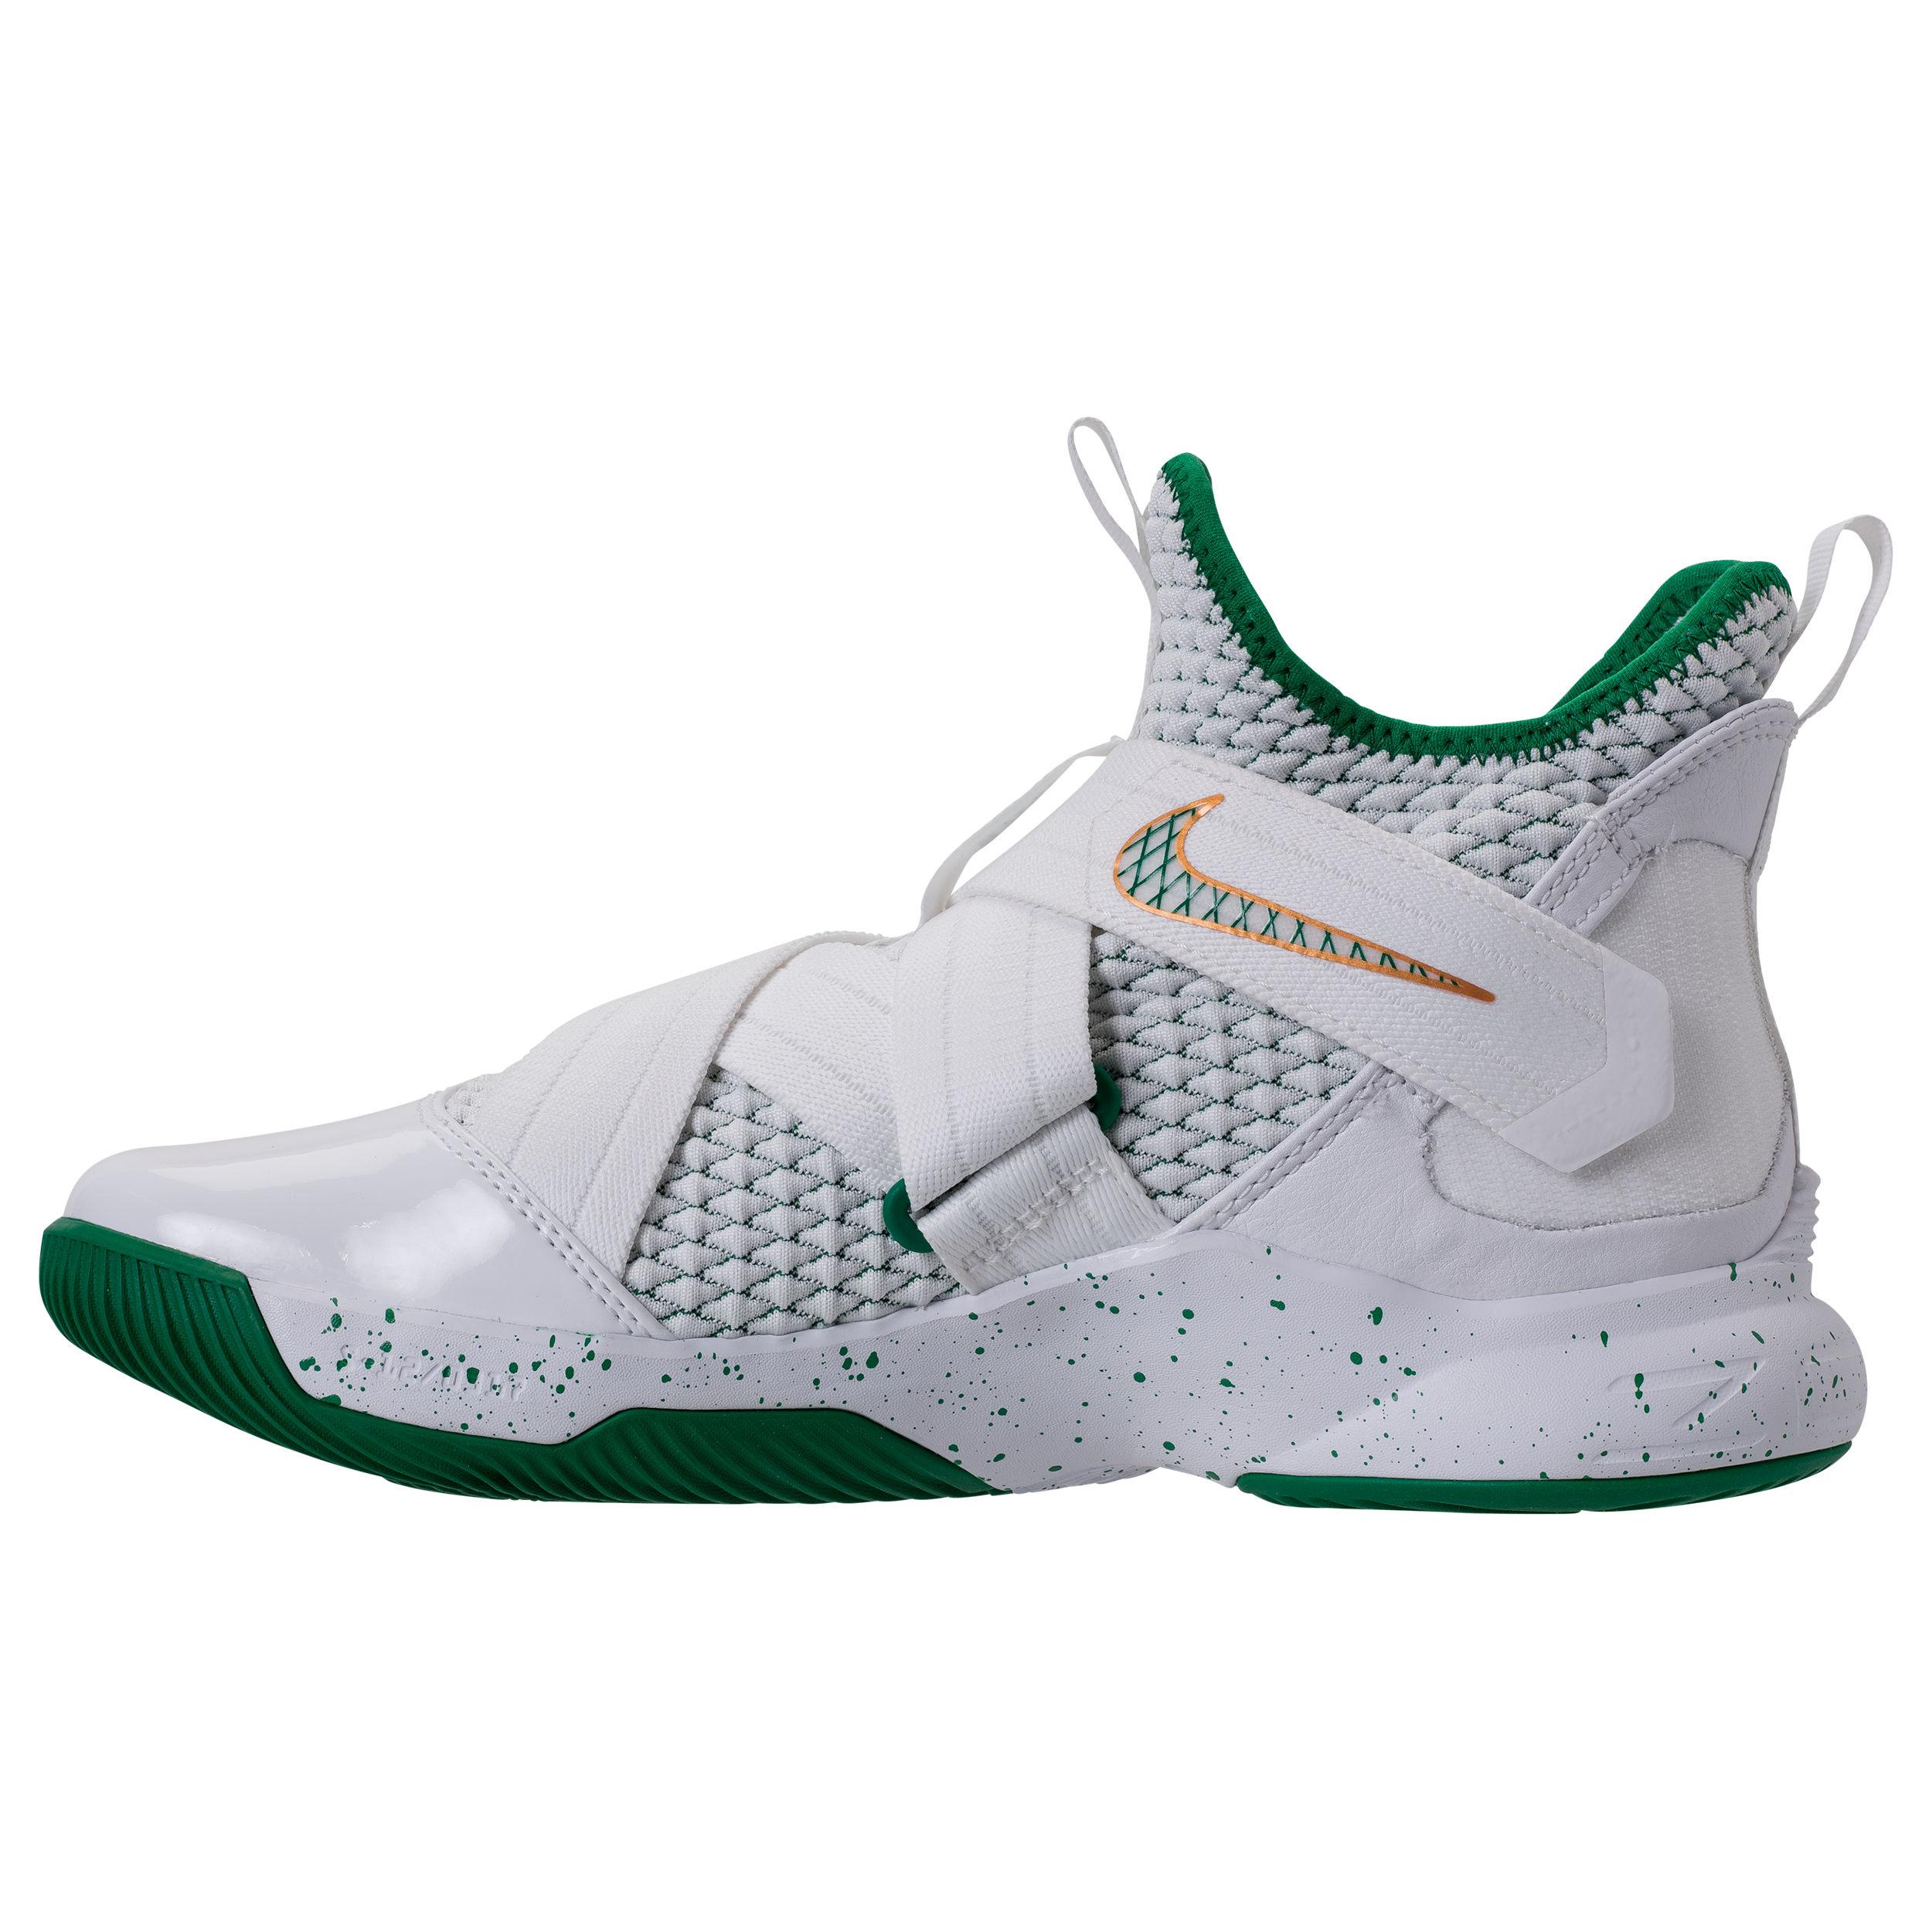 Nike LeBron Soldier 12 SVSM 4